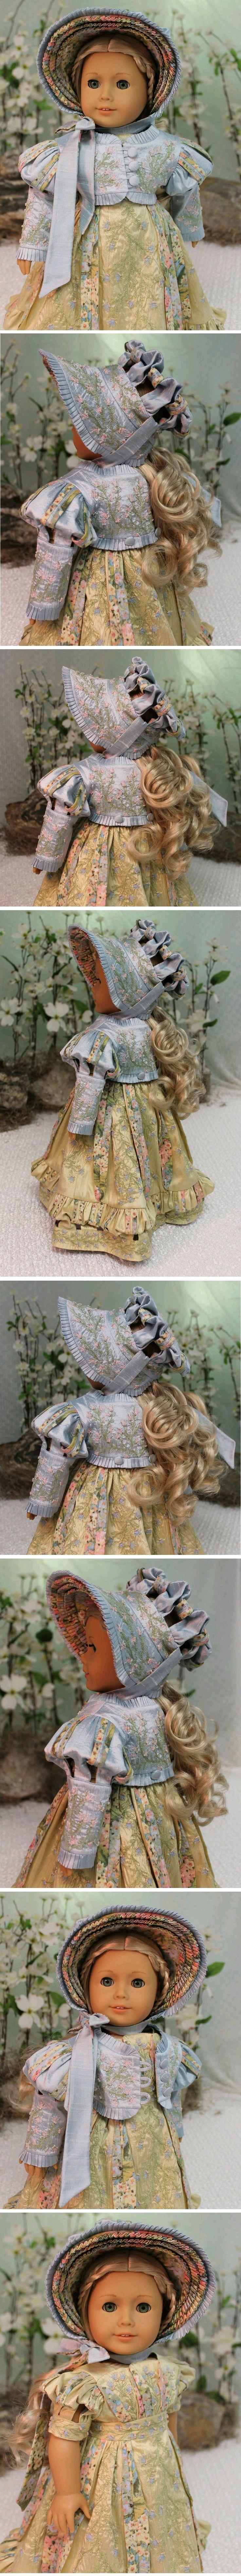 "MHD Designs ""Highbury"" OOAK for American Girl Doll Caroline and Others | eBay"